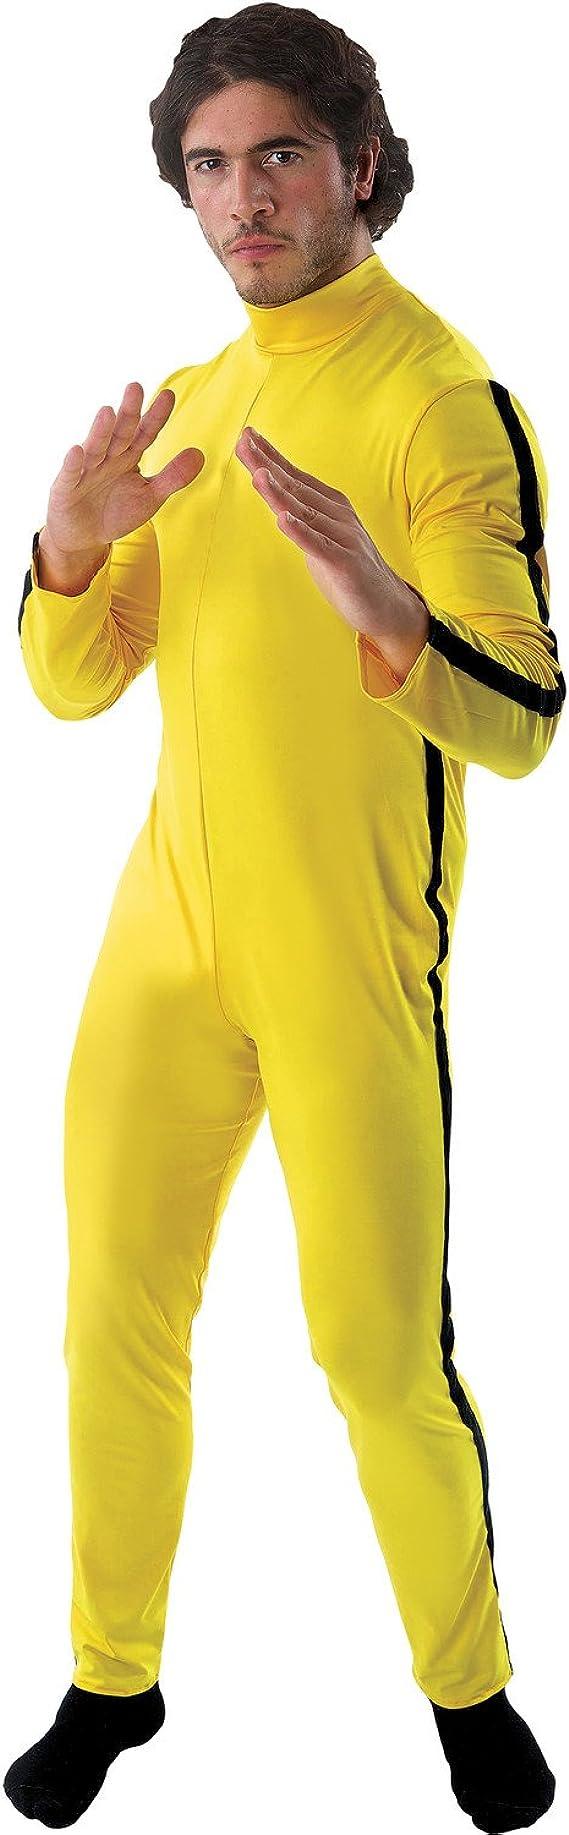 1970s Men's Clothes, Fashion, Outfits Orion Costumes Mens Bruce Lee Martial Arts Jumpsuit Fancy Dress Costume Yellow  AT vintagedancer.com